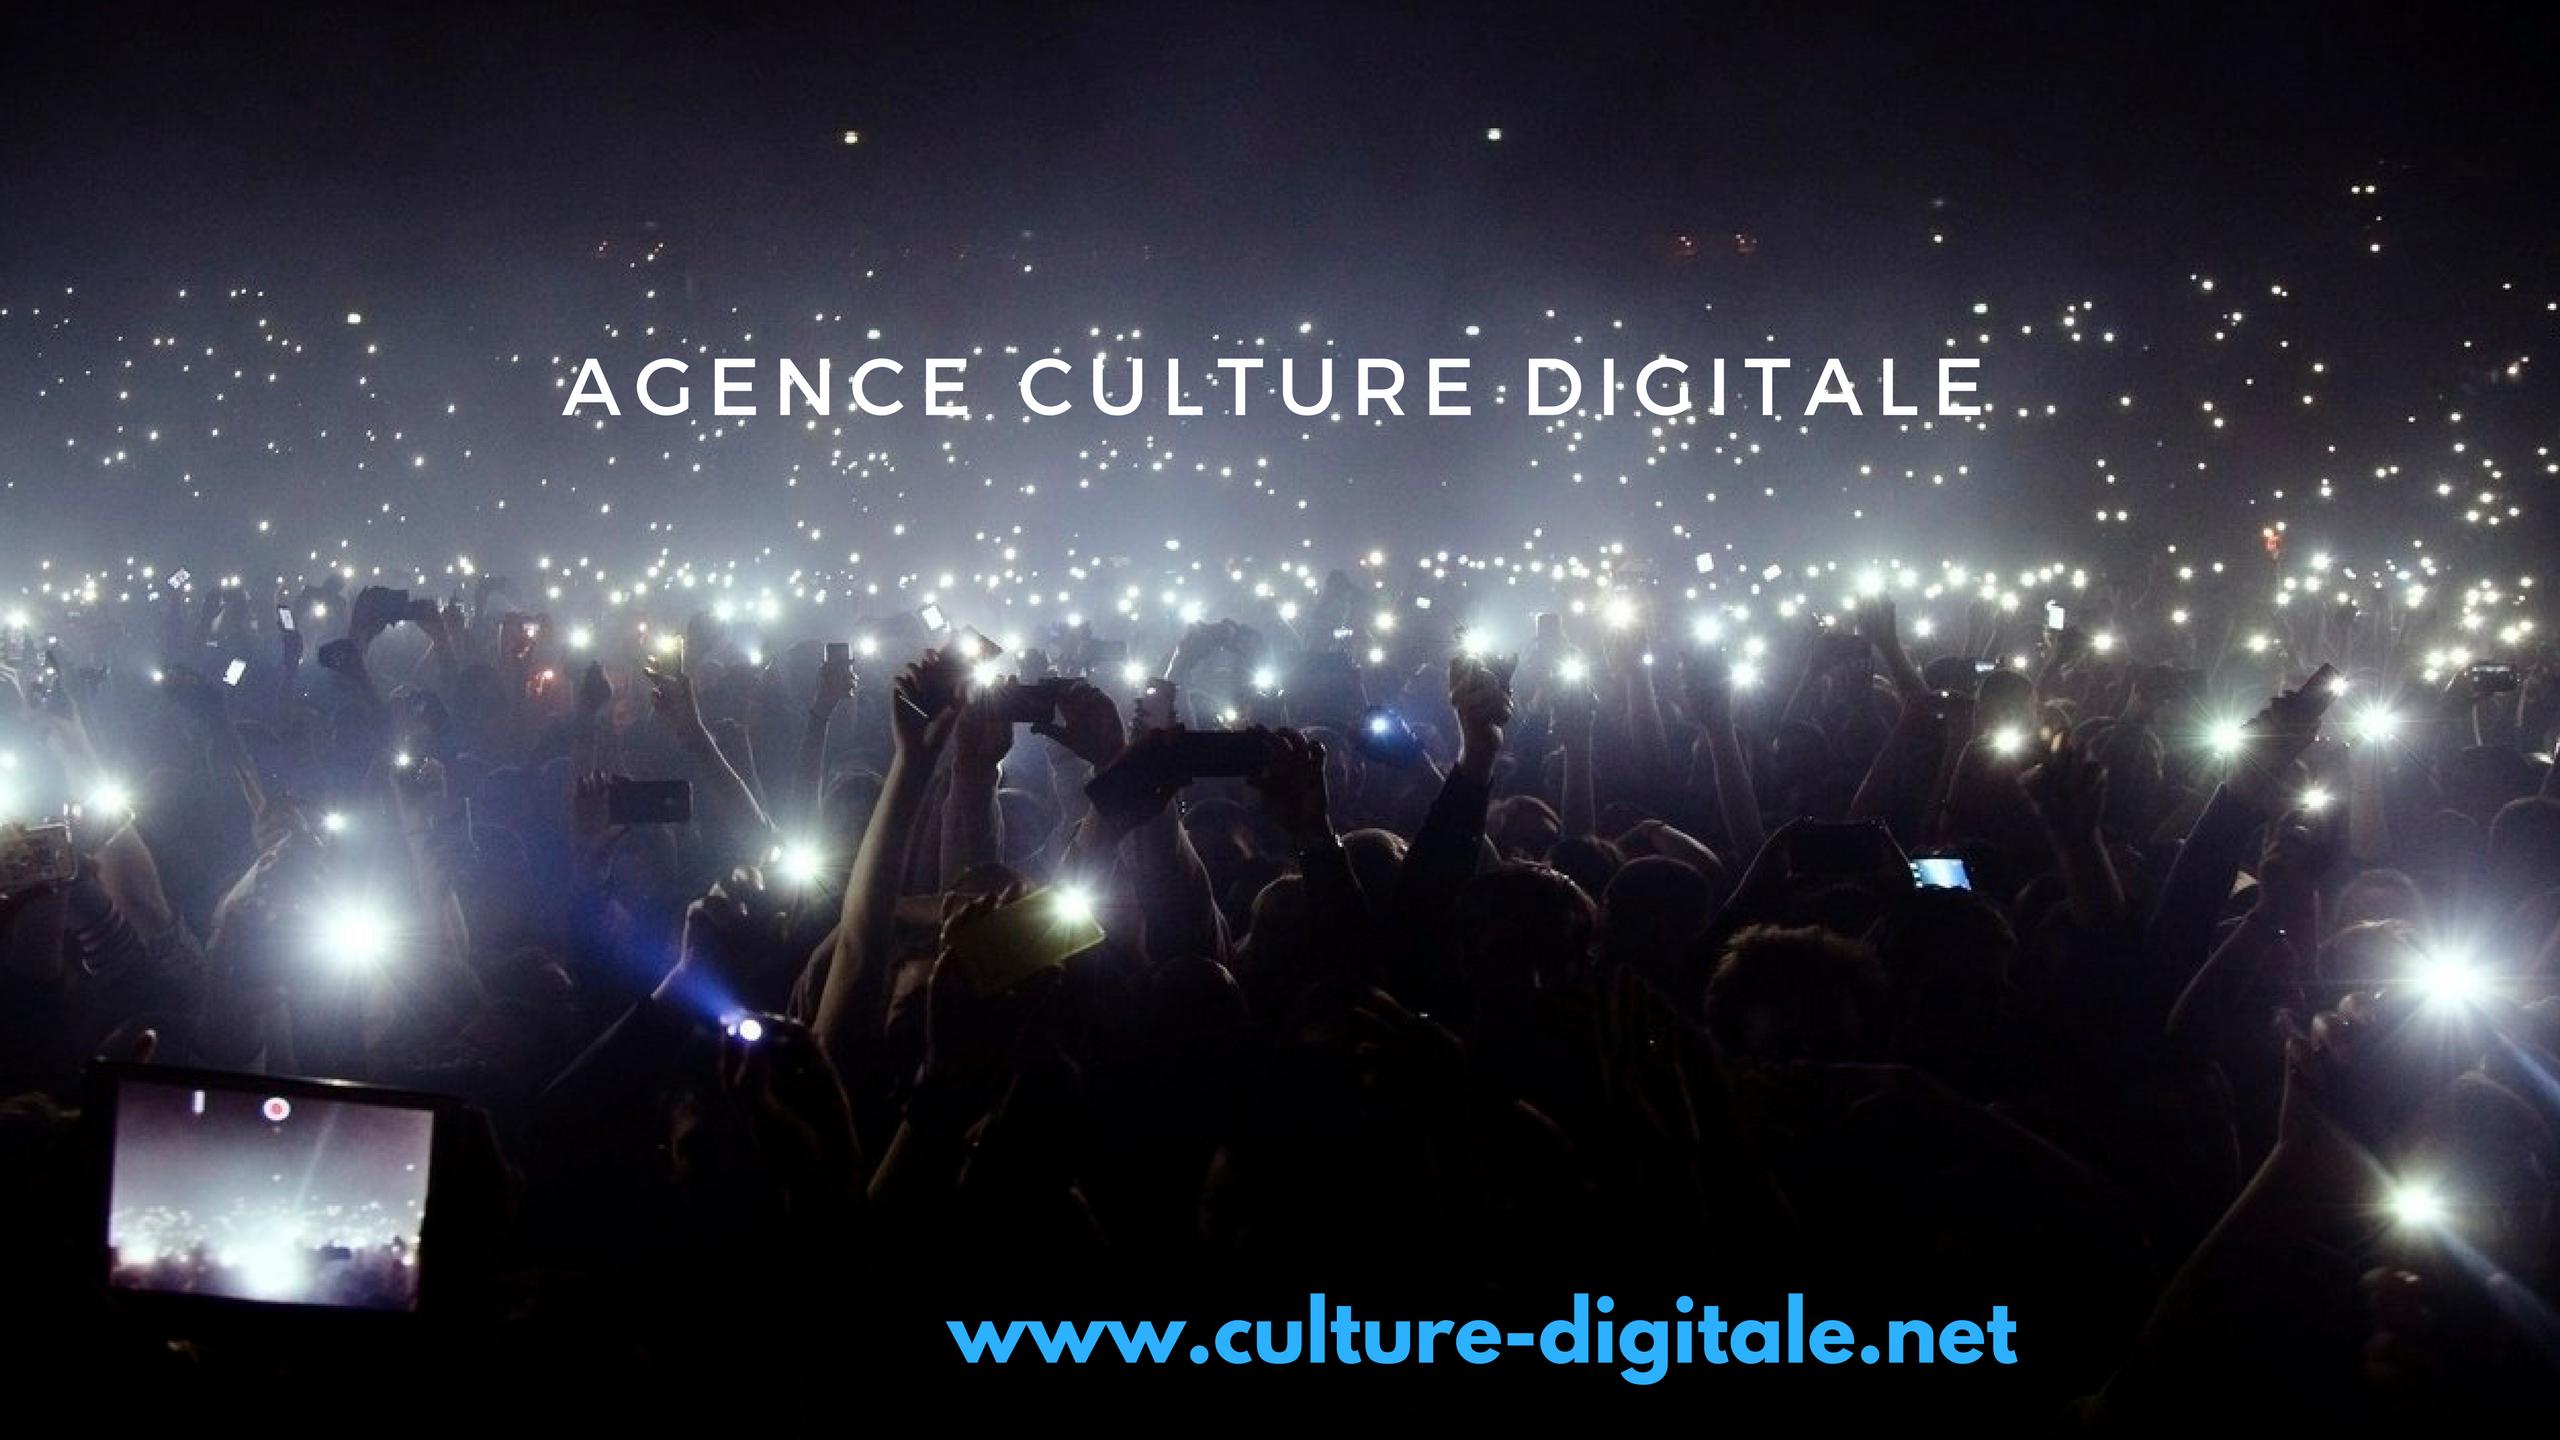 agence culture digitale nous contacter Nous contacter jazzmusic